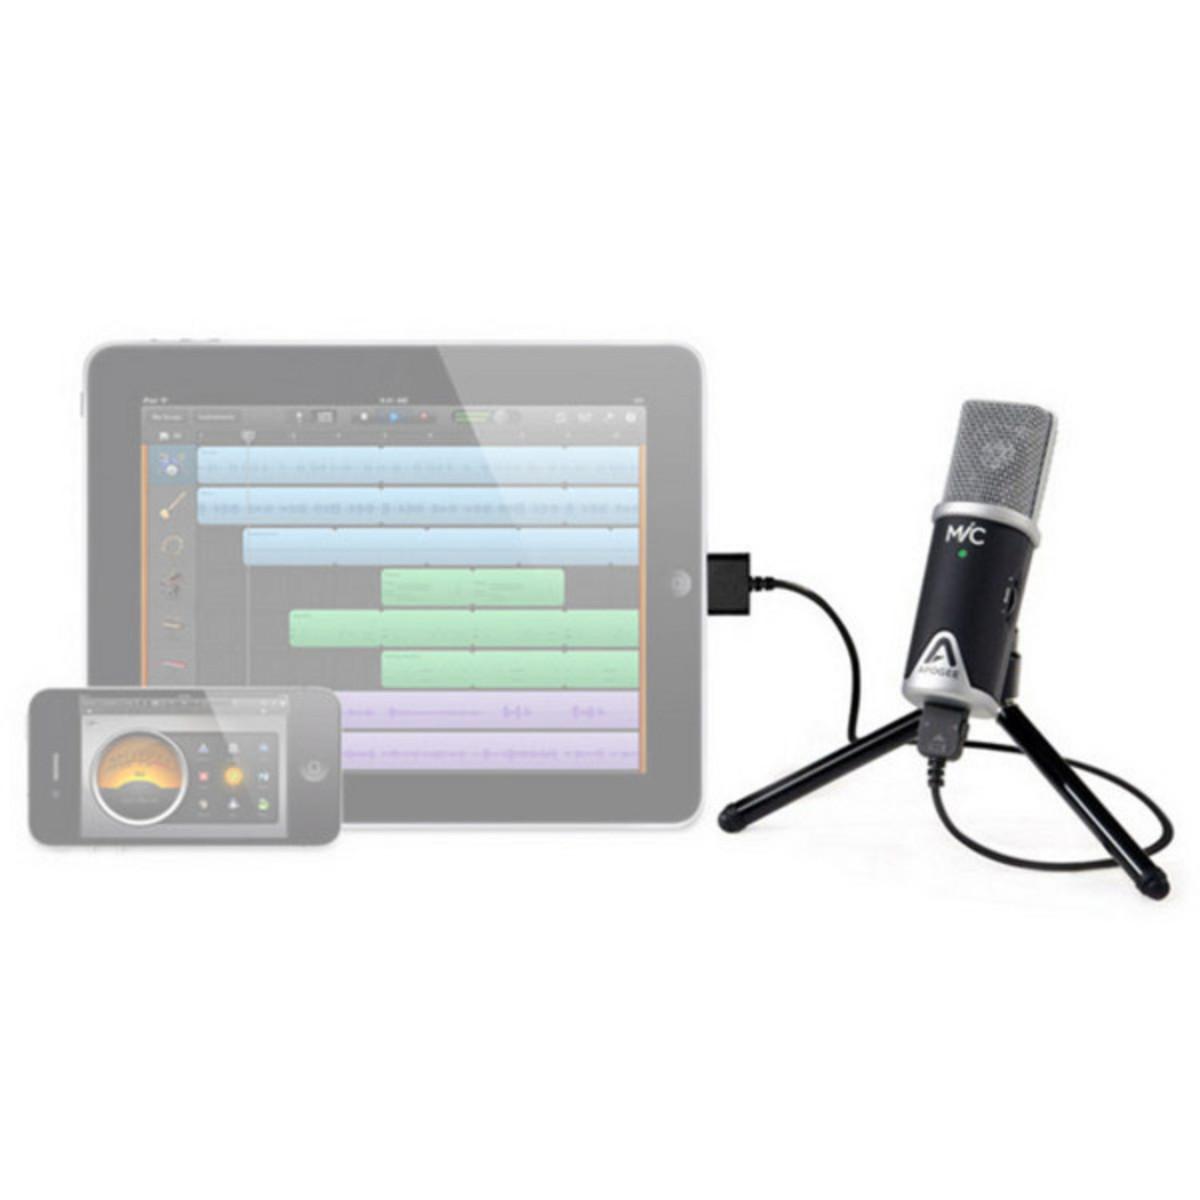 Apogee MiC USB Microphone for iPad, iPhone and Mac Nearly